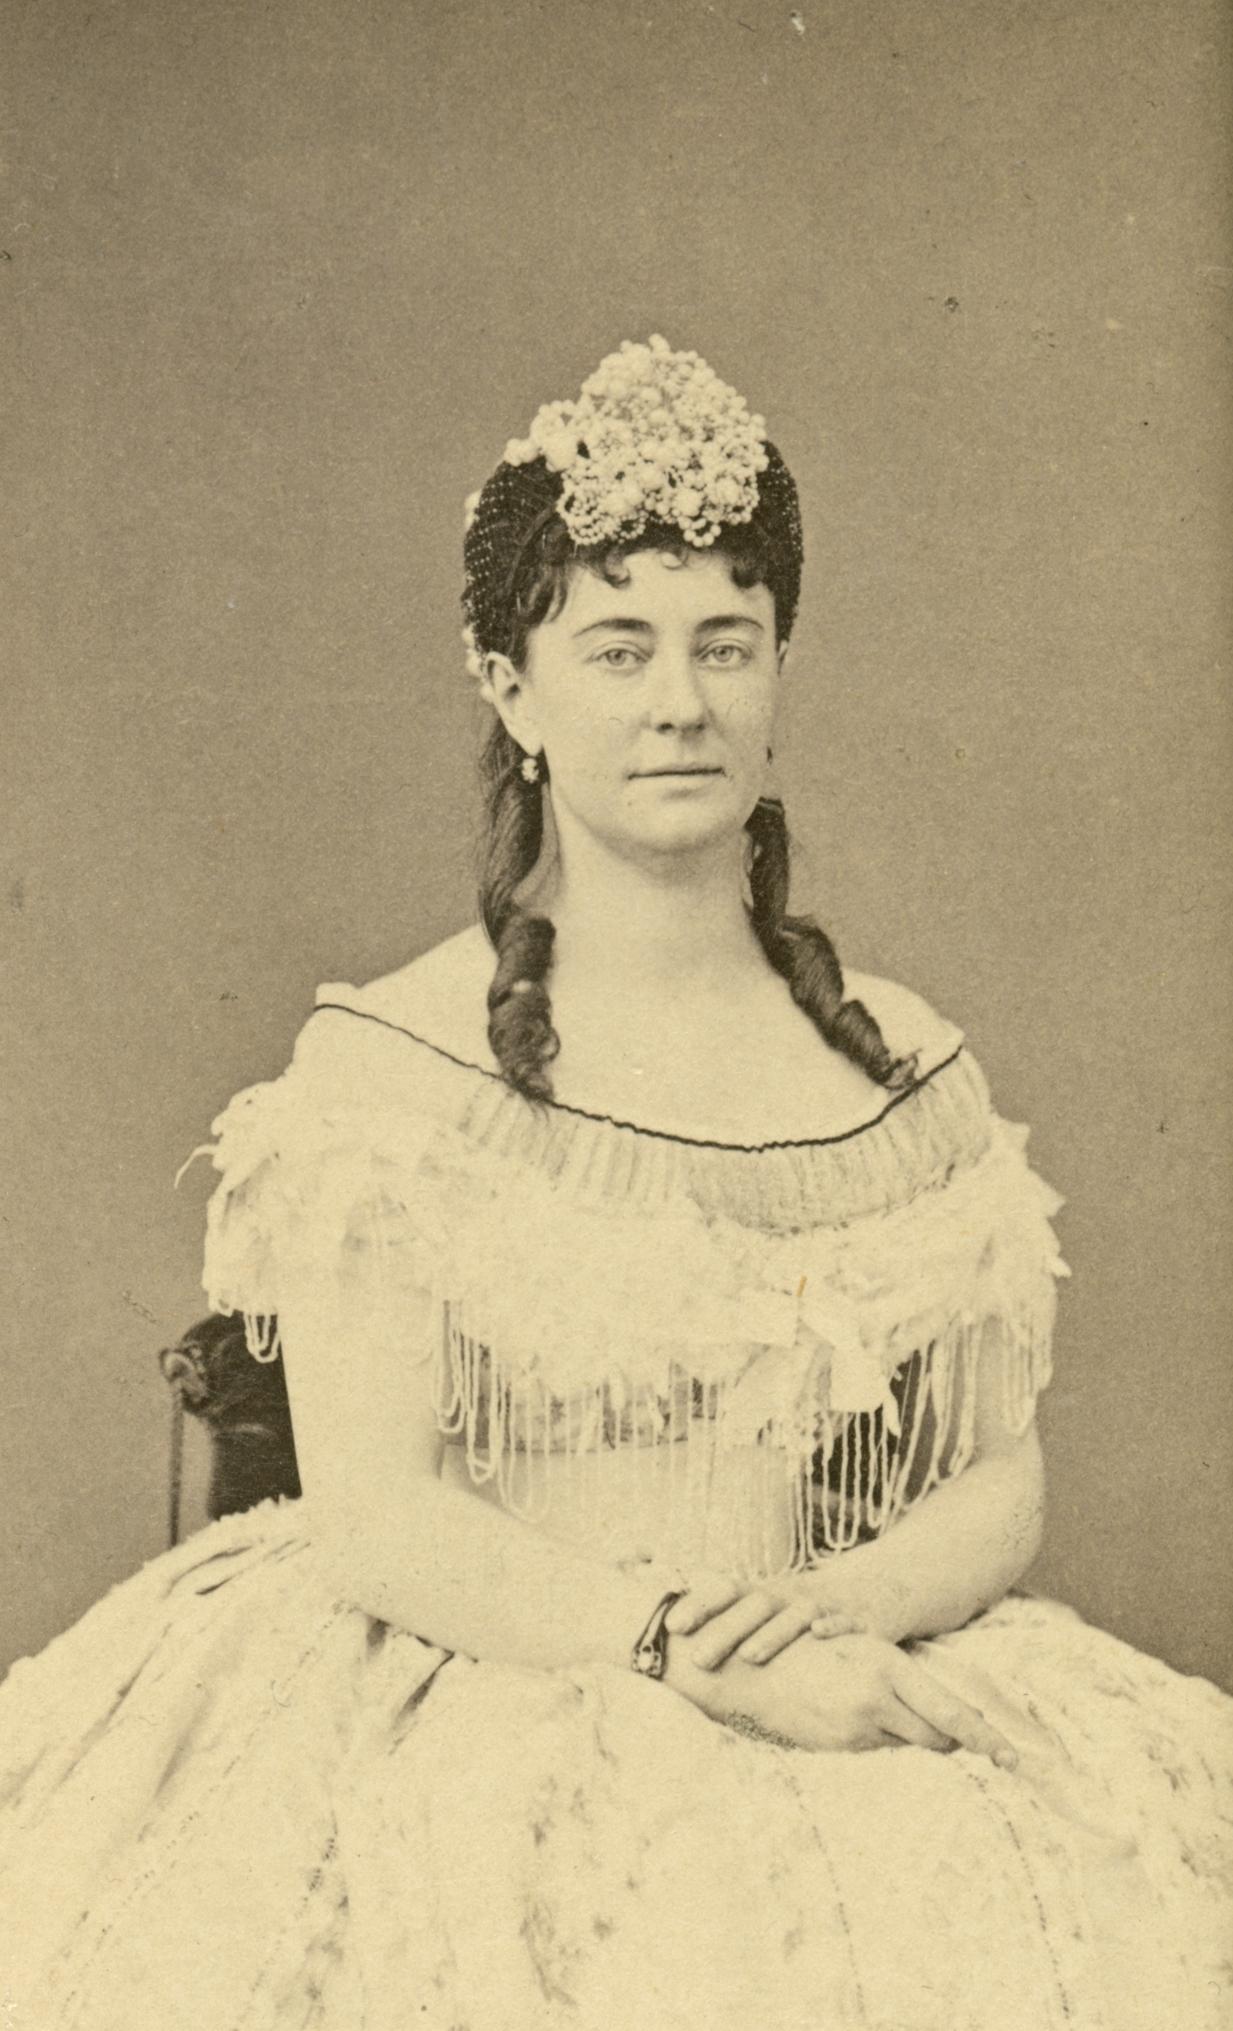 Zelma Hedin as Laurence Duvernoy in The Royal Dramatic Theatre's production of Hyresgäst och husegare, 1865. Photo: Mathias Hansen (1823-1905). Musik- och teaterbiblioteket, Stockholm (H4_040)